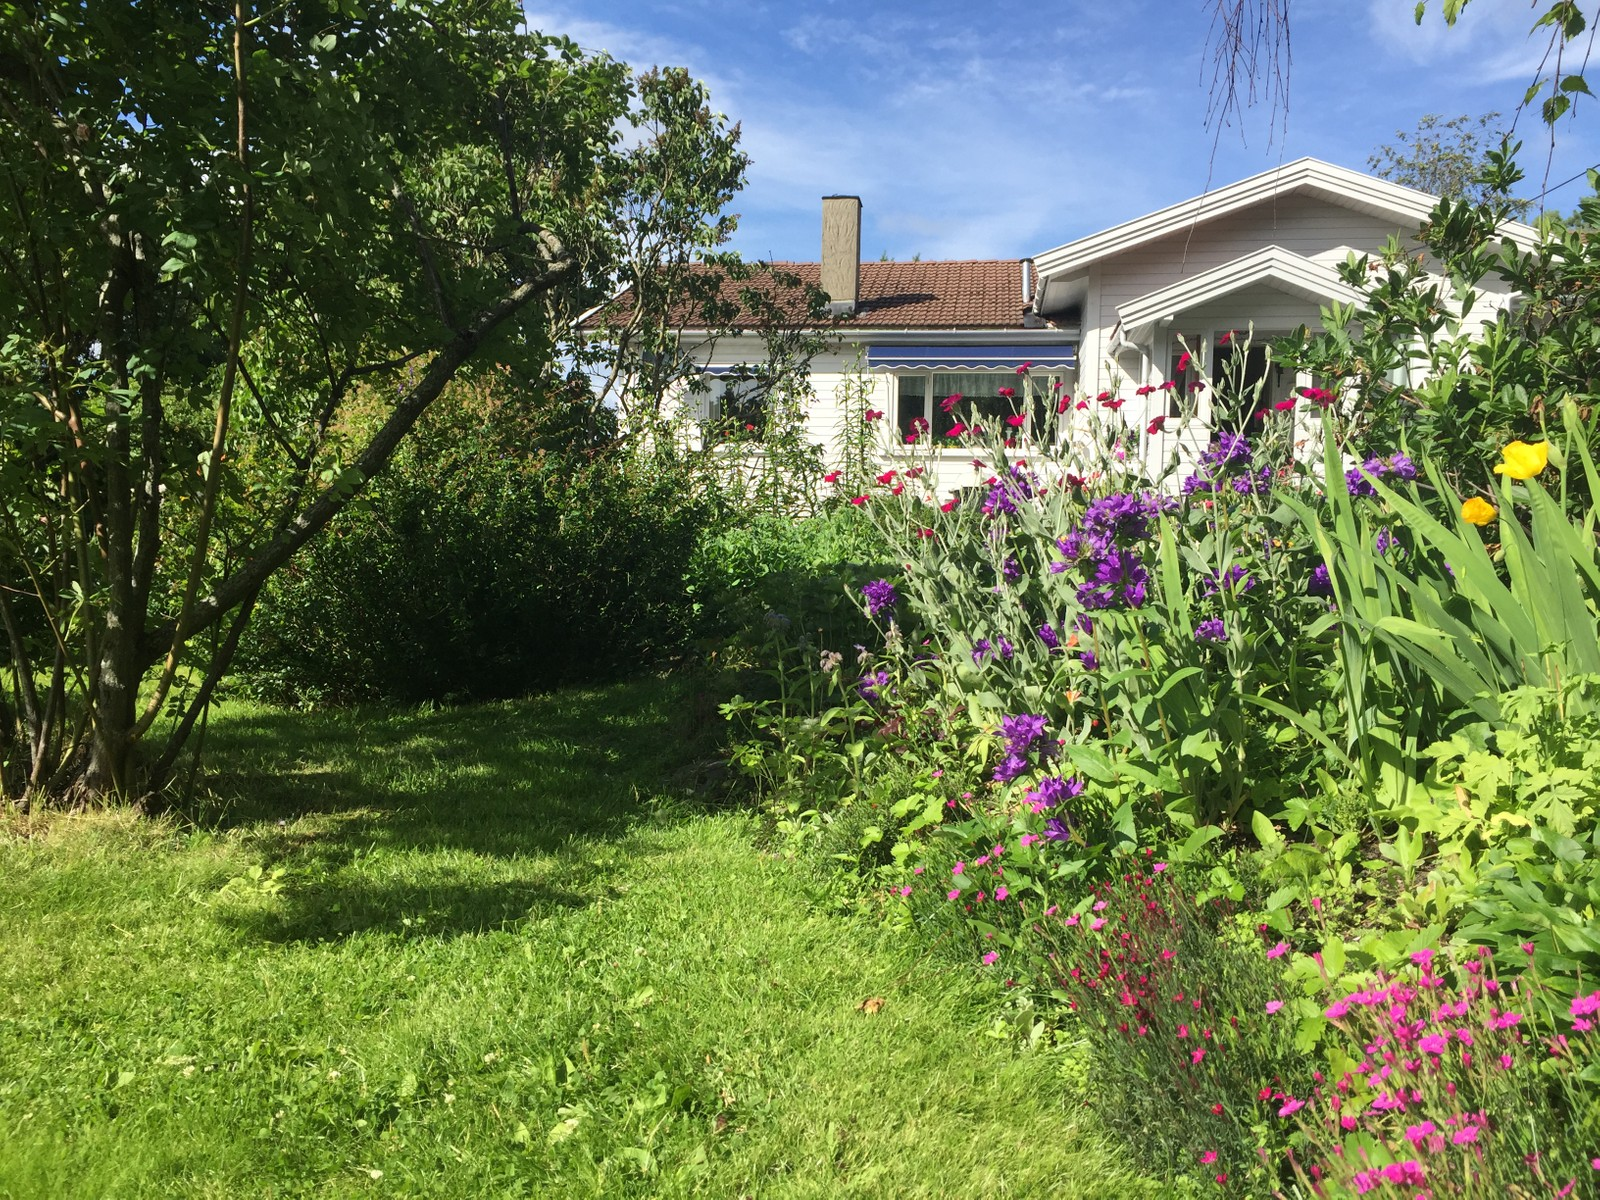 Et hvitmalt hus i en frodig hage.